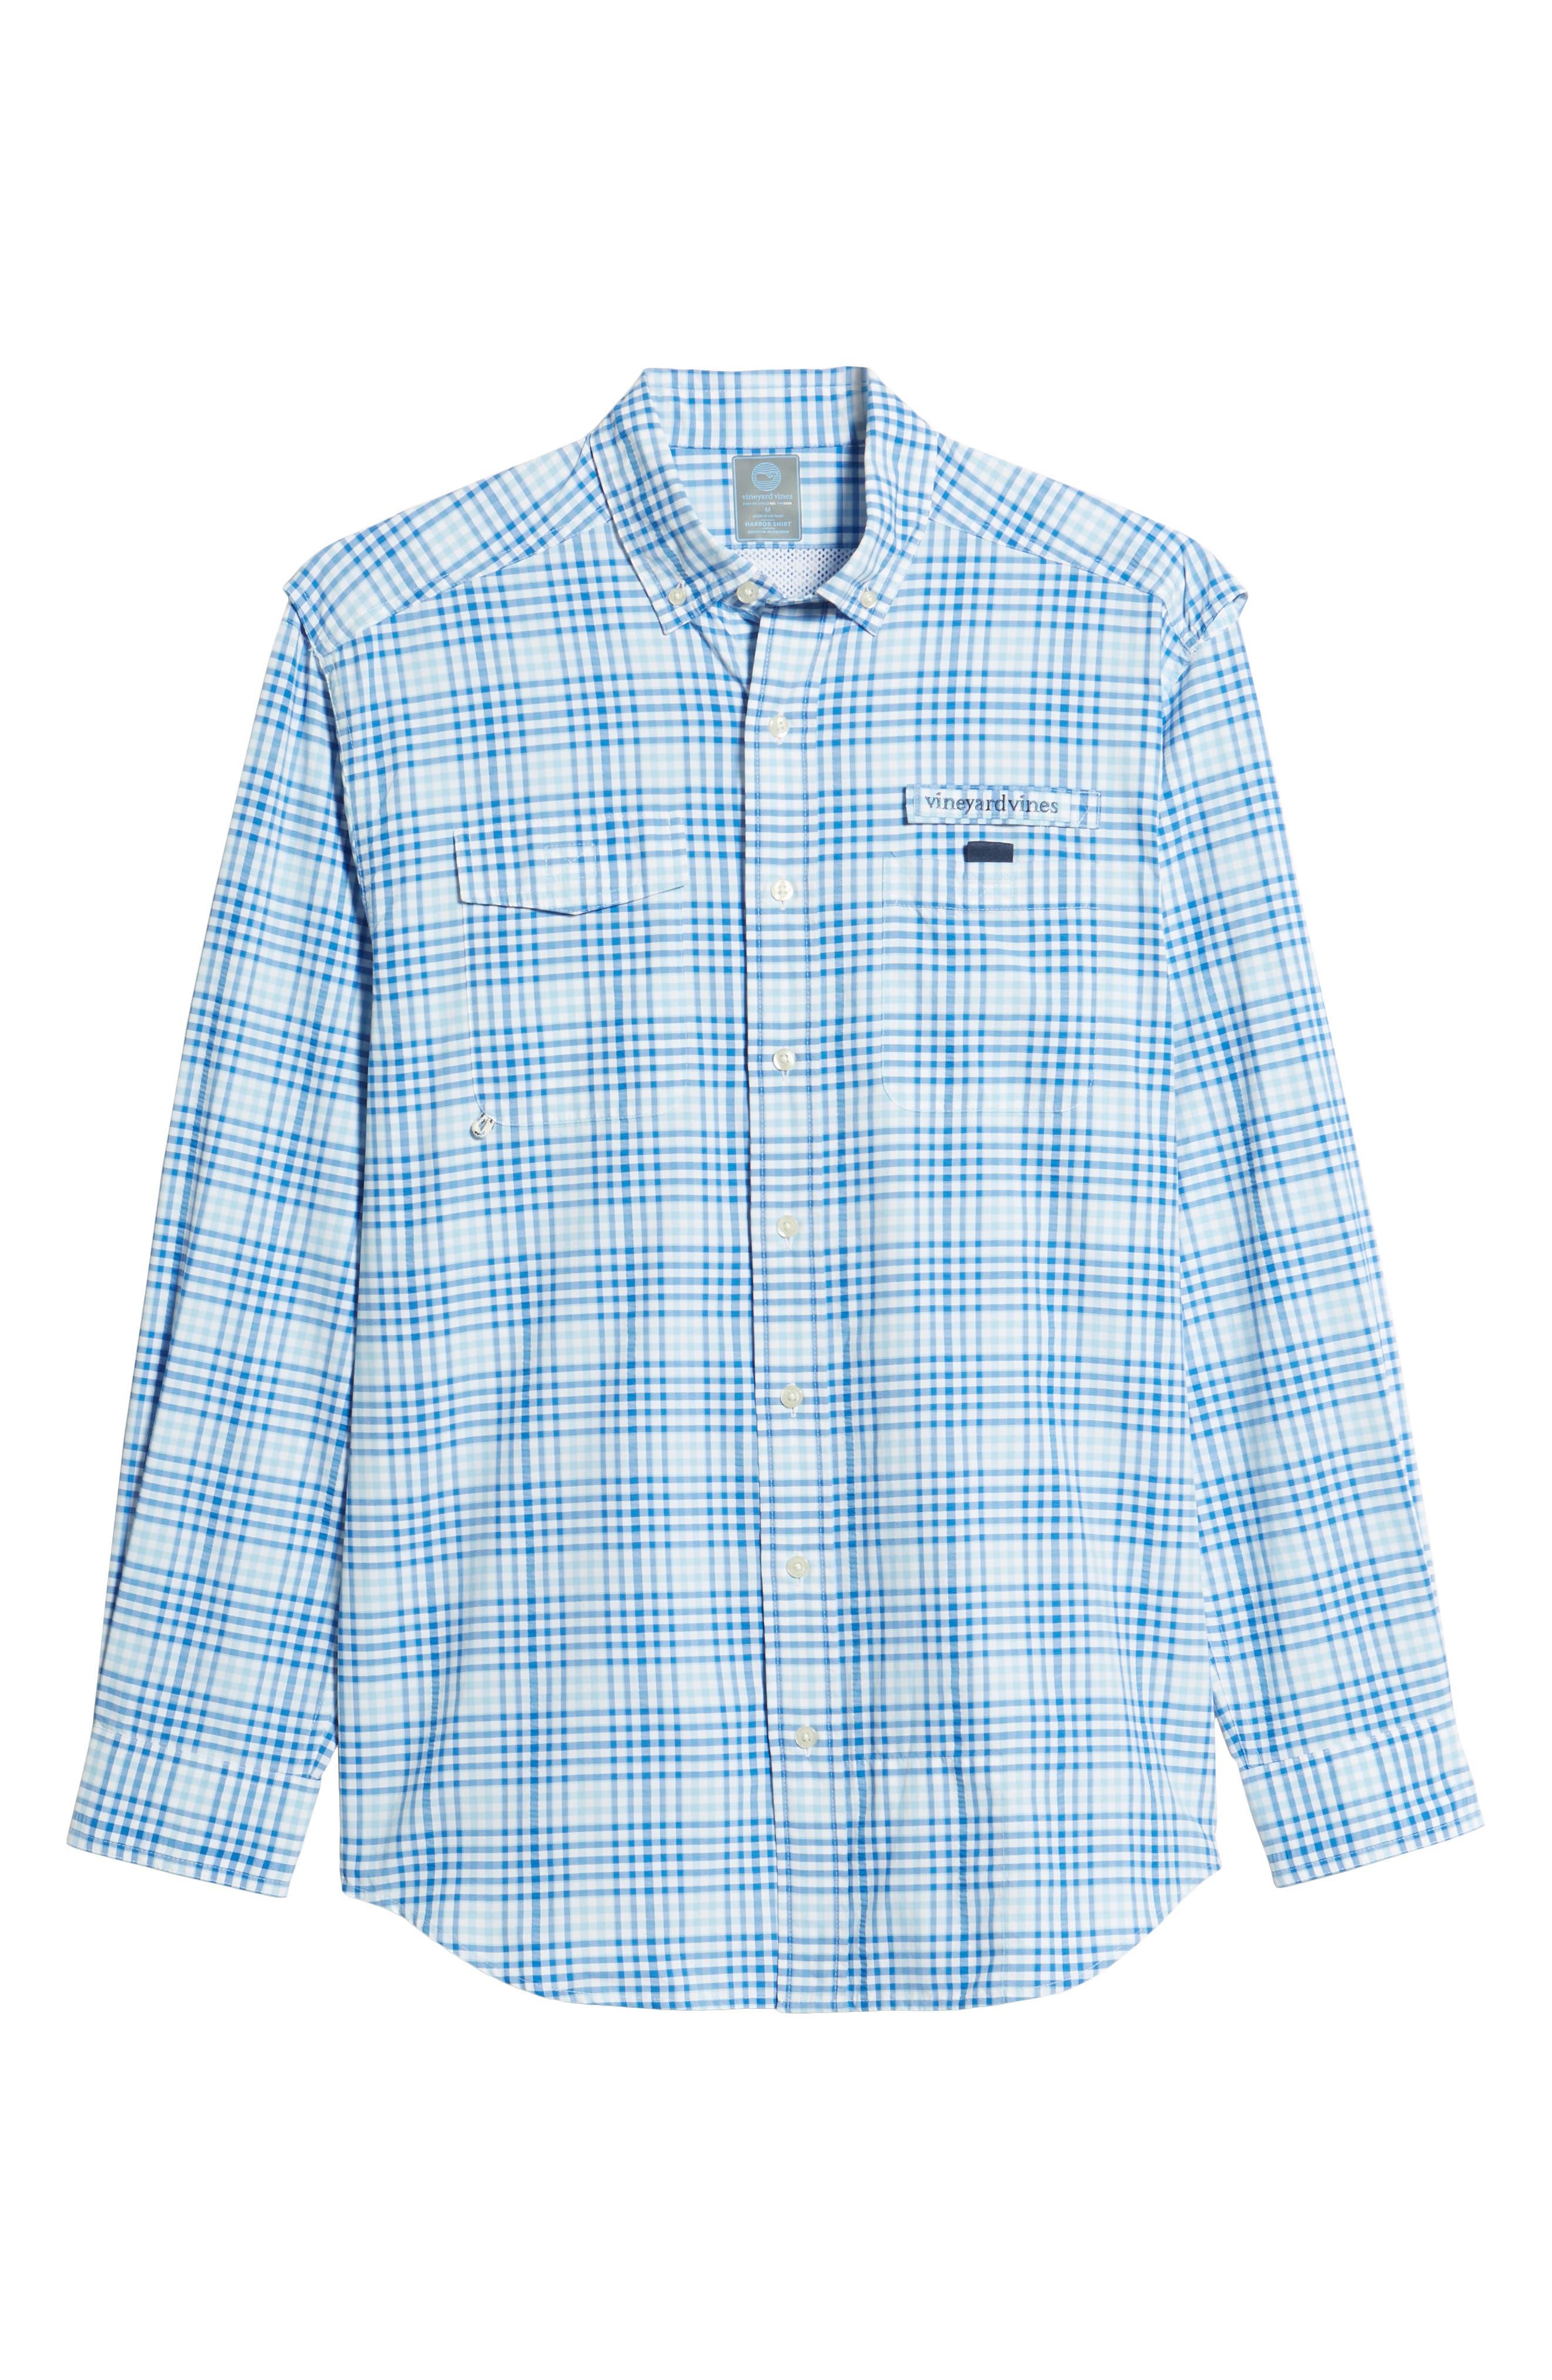 South Shore Harbor Regular Fit Plaid Performance Sport Shirt,                             Alternate thumbnail 6, color,                             JAKE BLUE